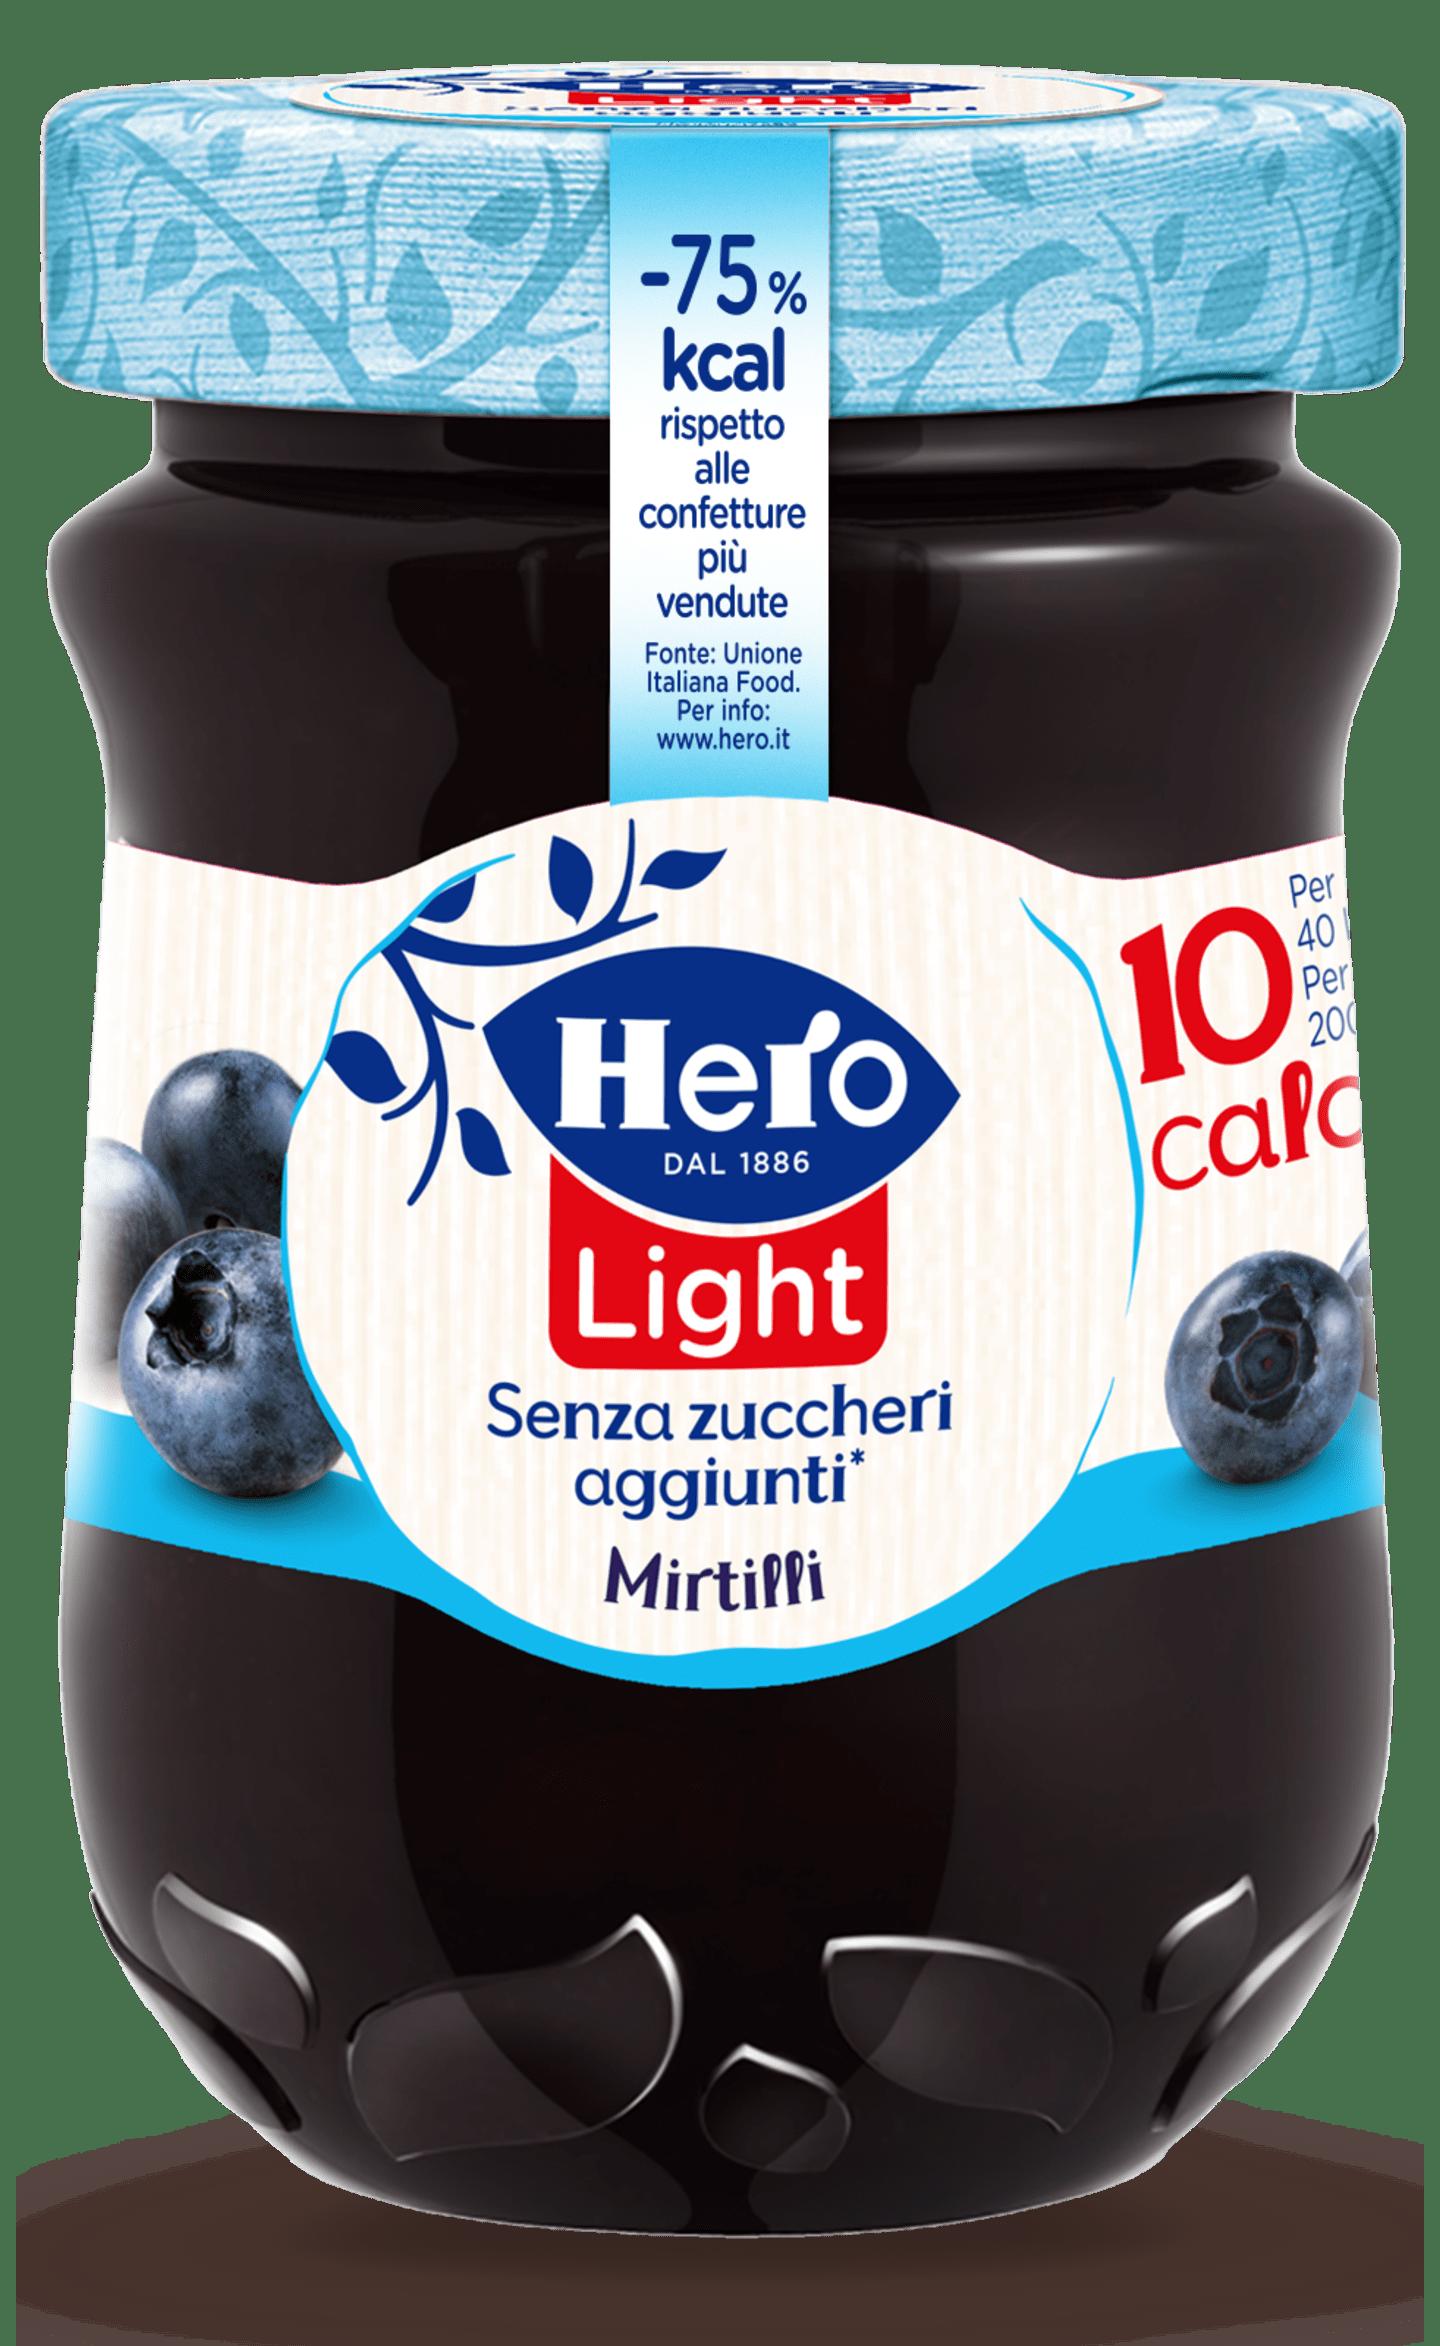 Marmellata di mirtilli hero light